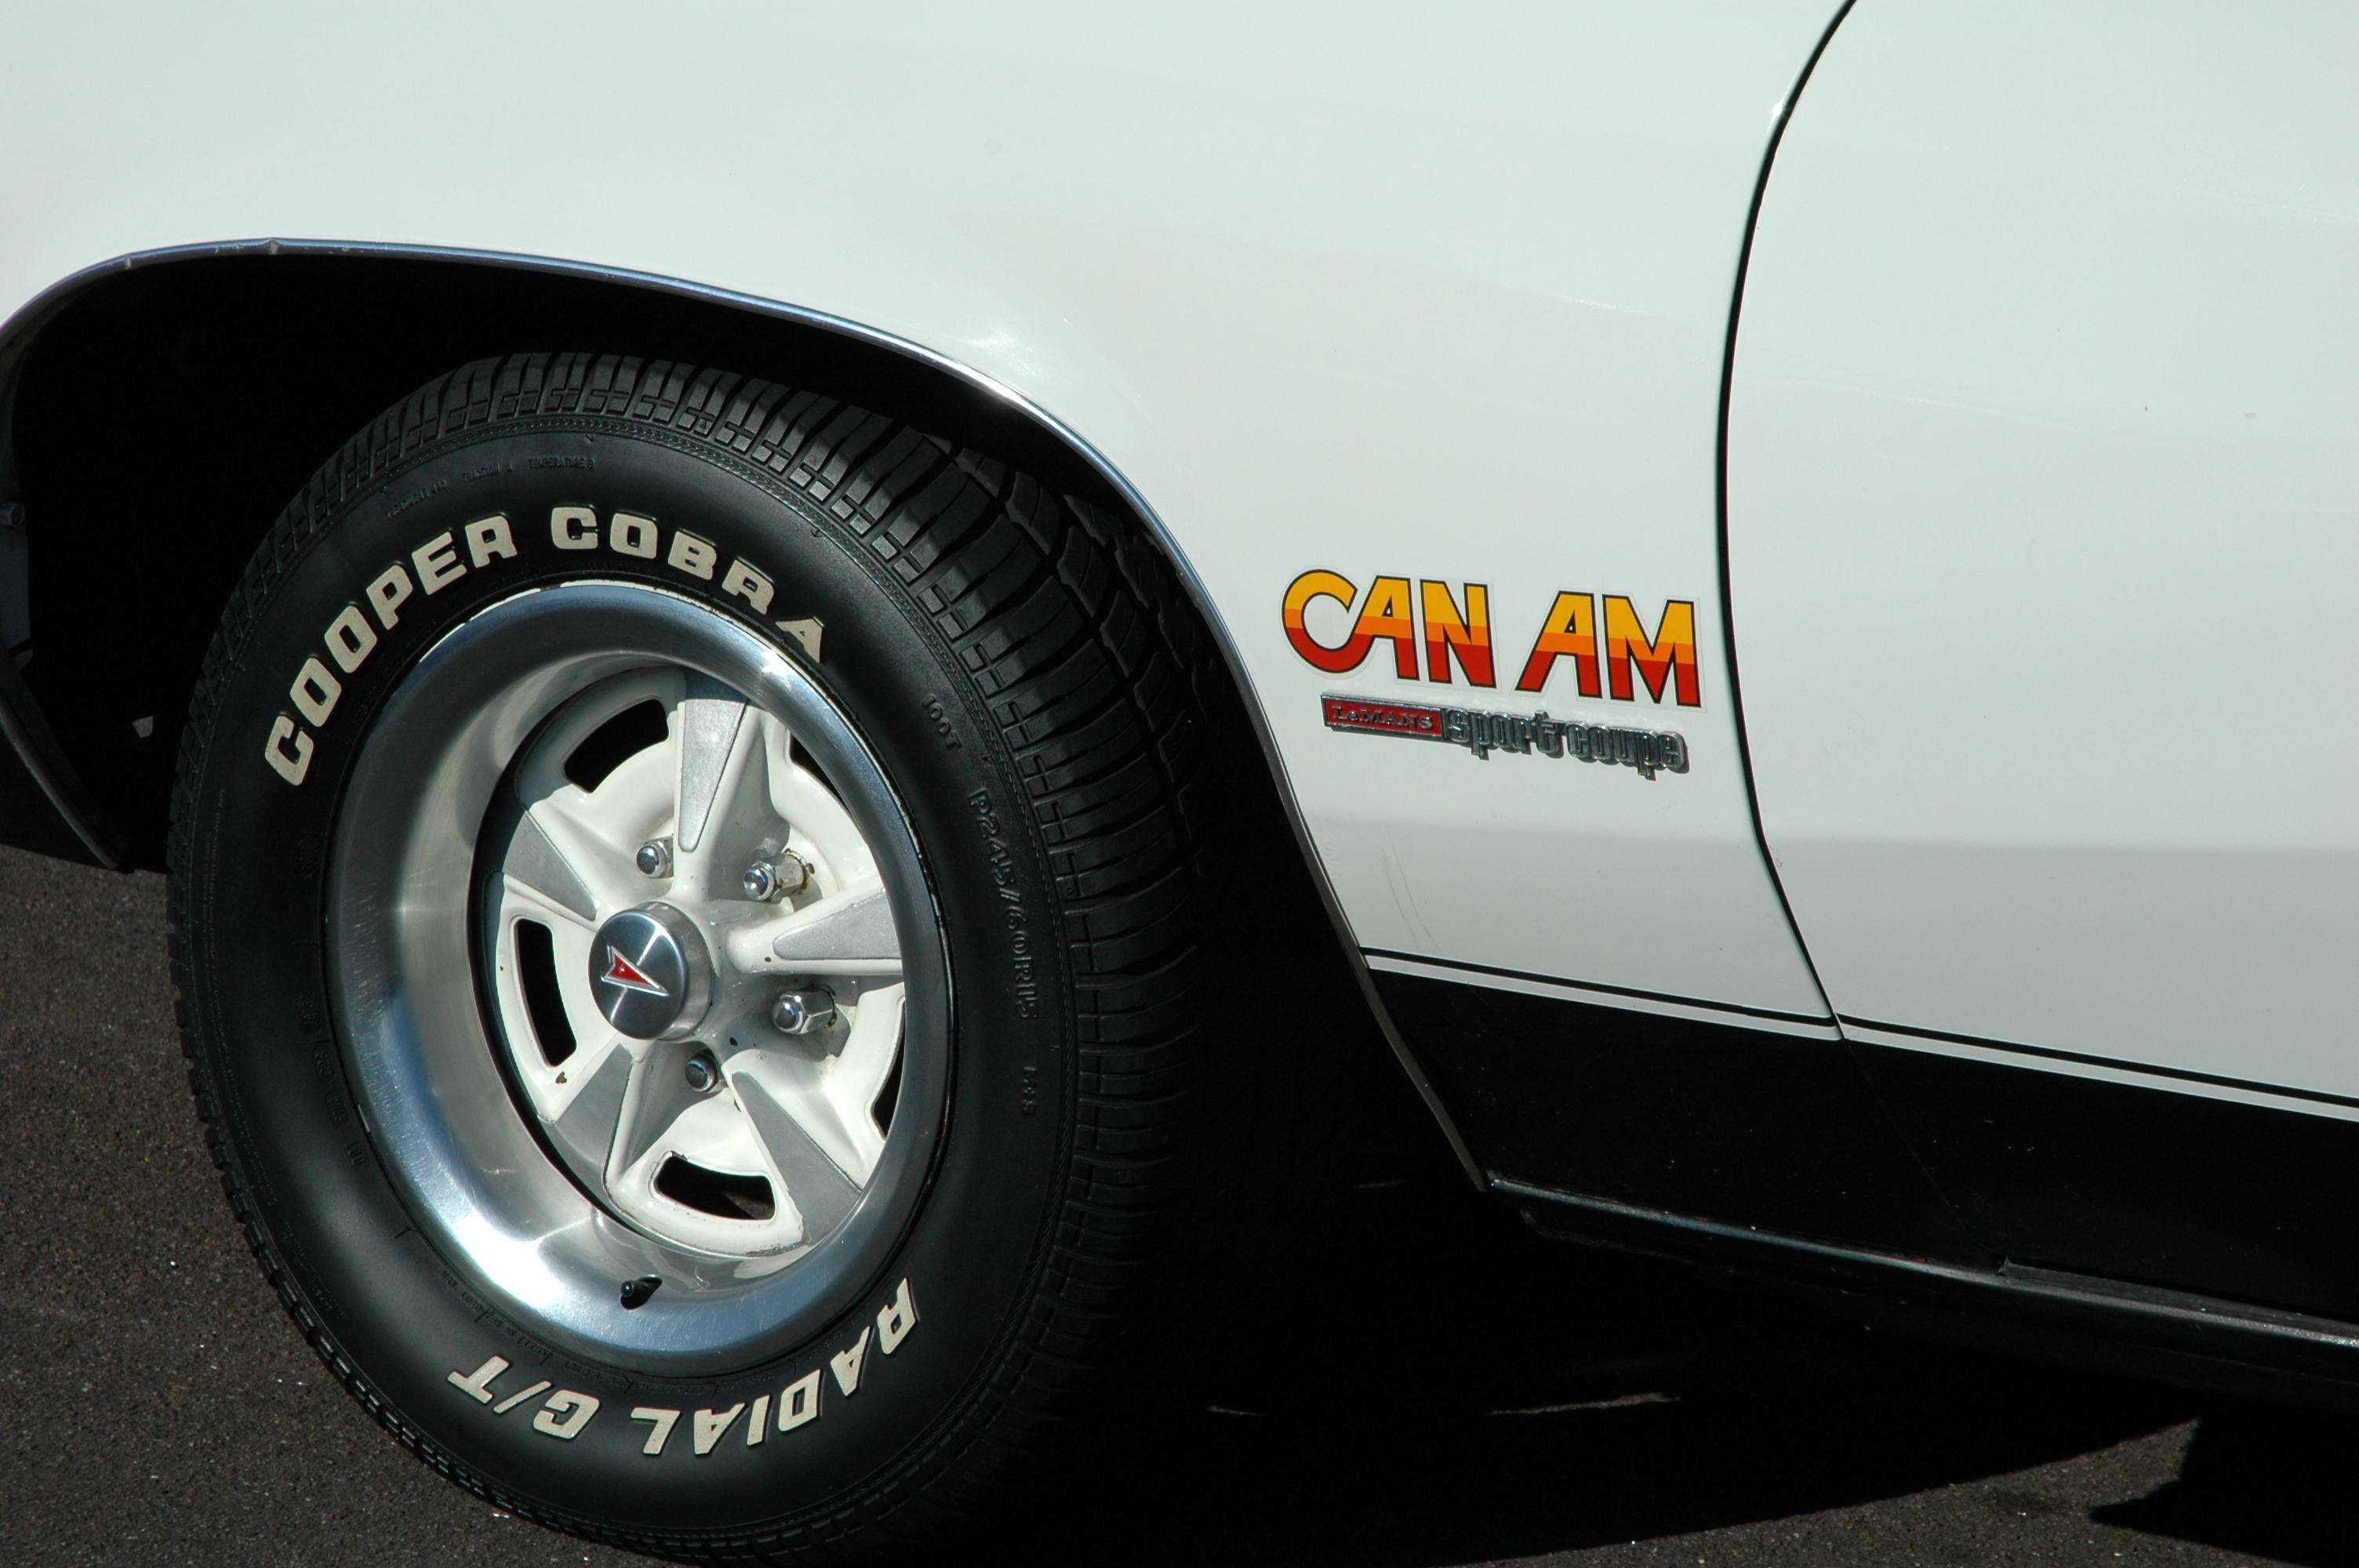 1977 Pontiac Can Am front quarter sticker detail